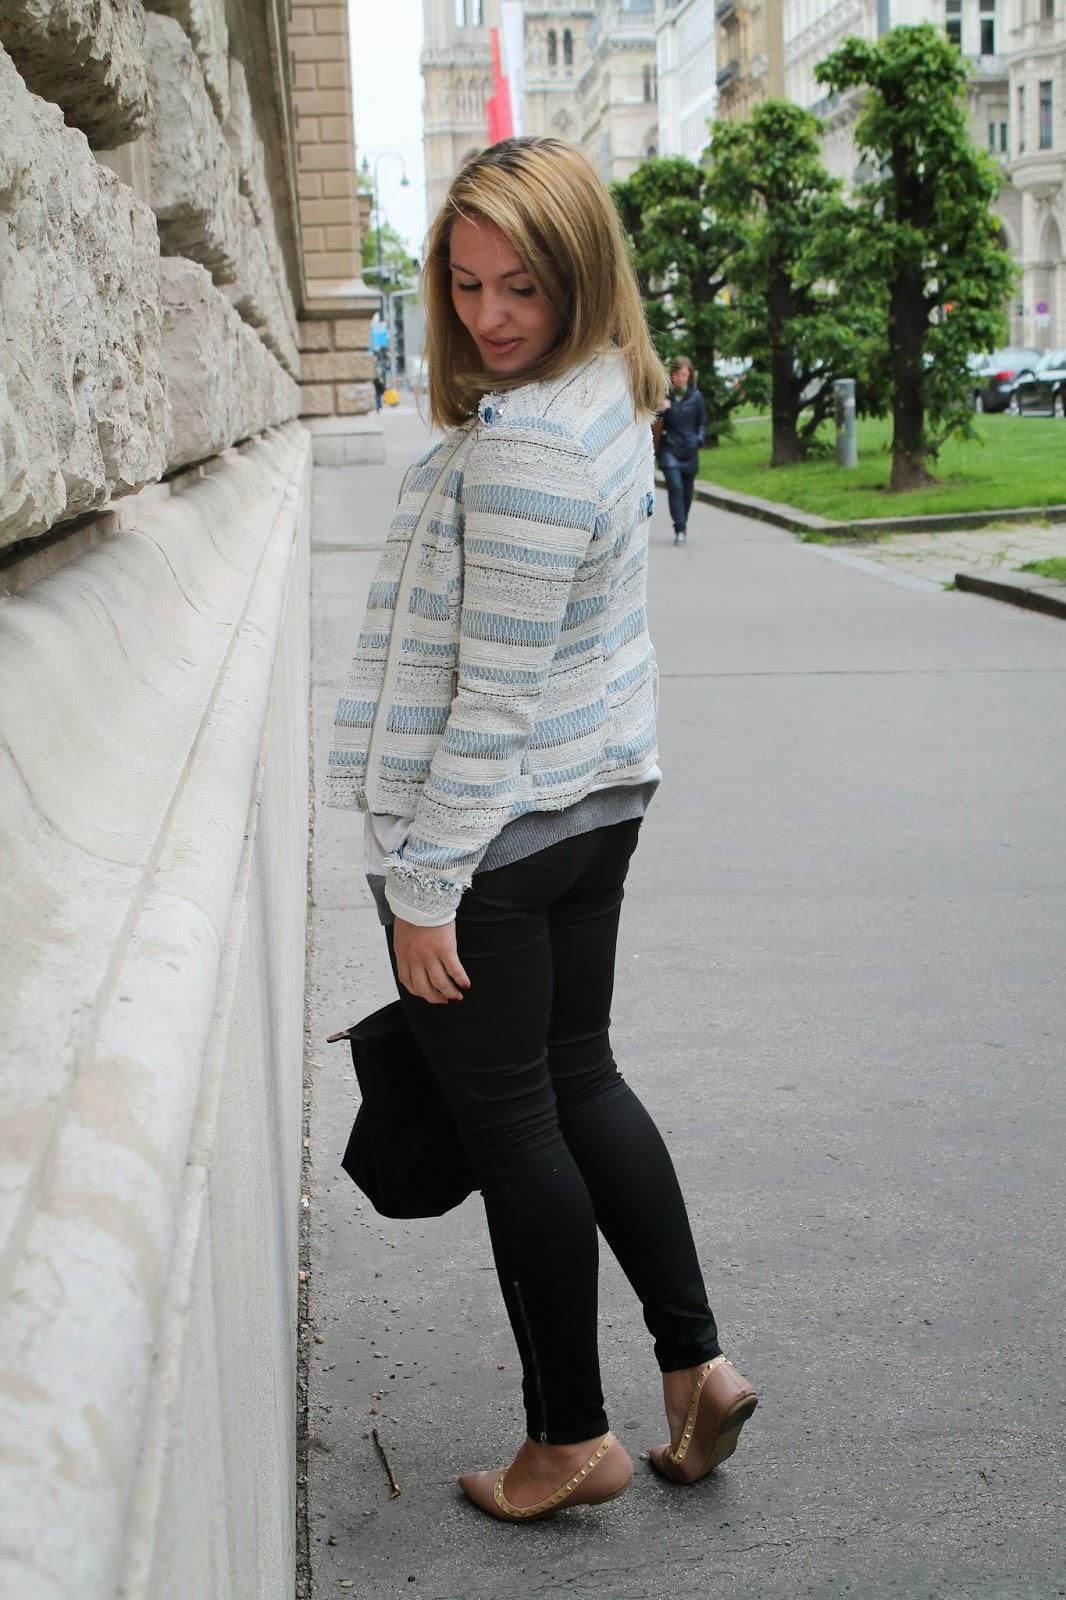 Fashionblogger Austria / Österreich / Deutsch / German / Kärnten / Carinthia / Klagenfurt / Köttmannsdorf / Spring Look / Classy / Edgy / Boucle / Longchamp / Le Pliage / Statement / Valentino Dupe / Mango / Zara / H&M/ Forever 21 / C&A